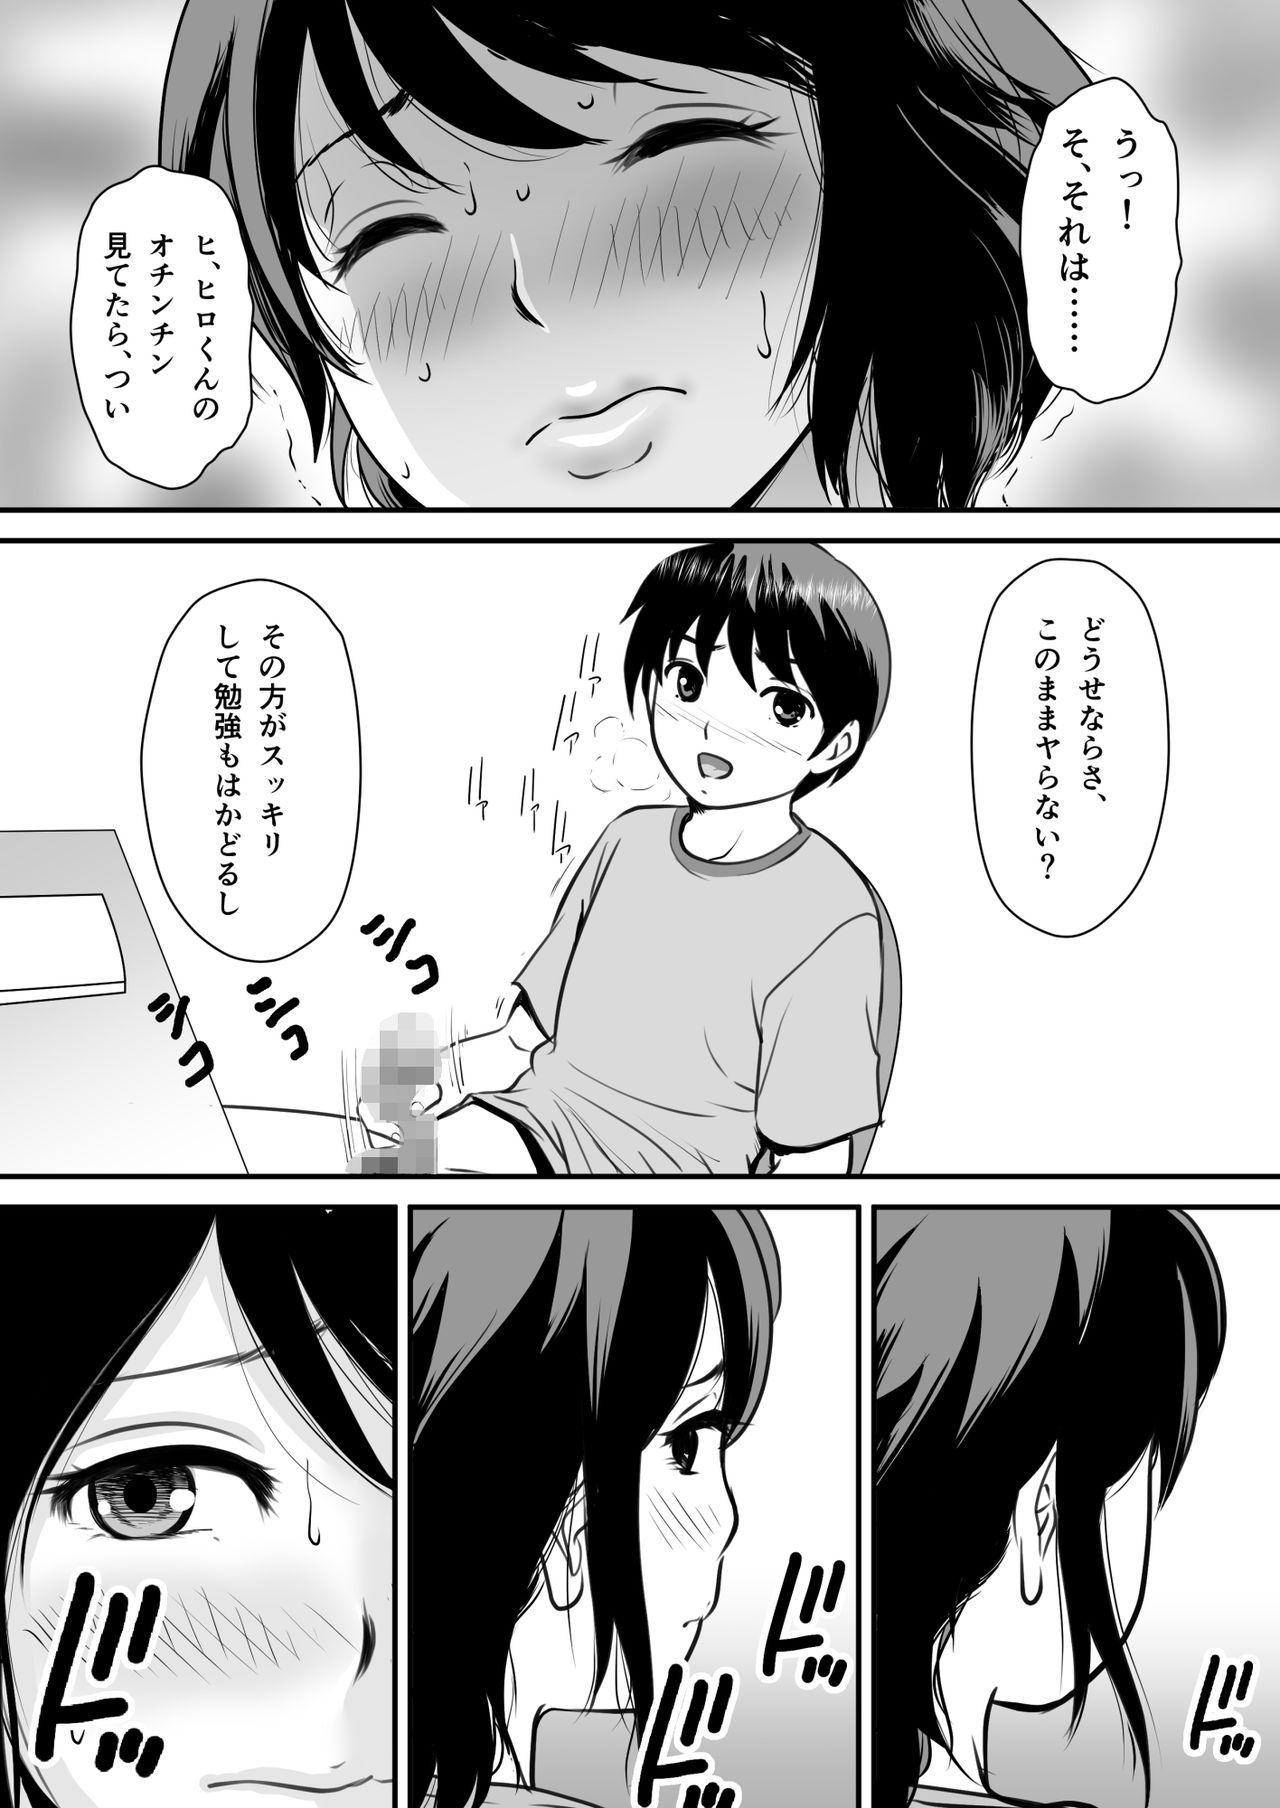 [Milky Club] Netori Appli -Kuso Oyaji kara Kaa-san o Netotta ken- 8